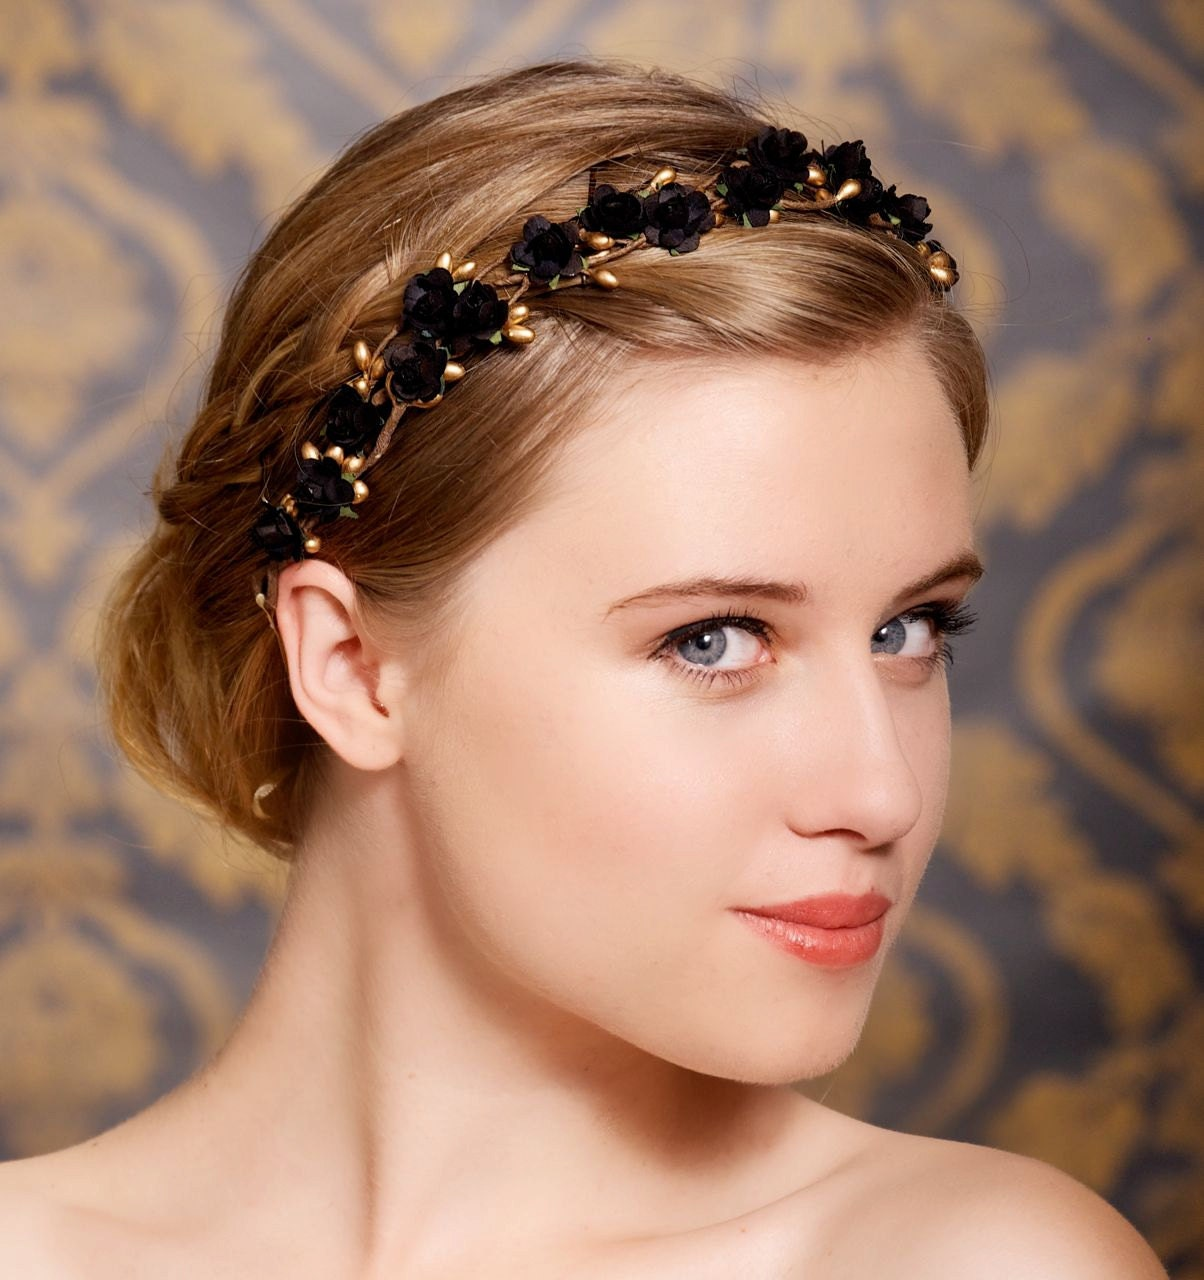 Black Wedding Hairstyles With Crown: Black Flower Hair Crown Bridal Hair Wreath By GildedShadows